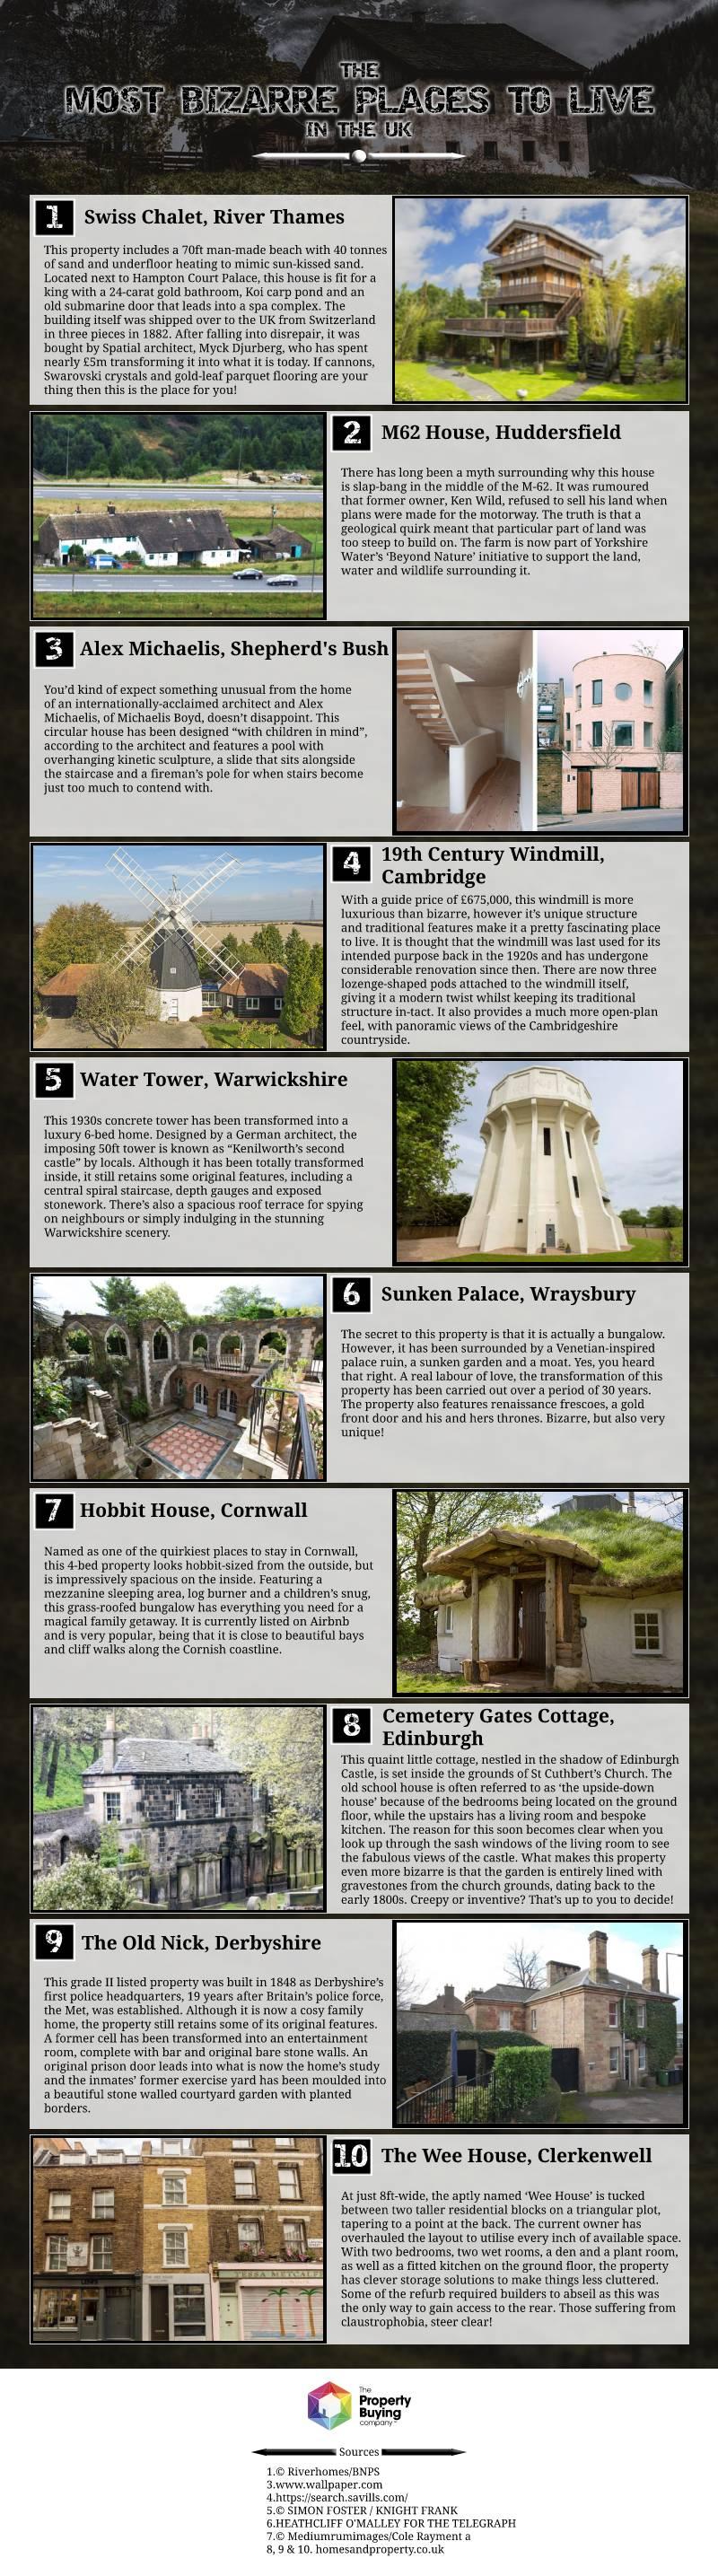 Bizarre Places Infographic